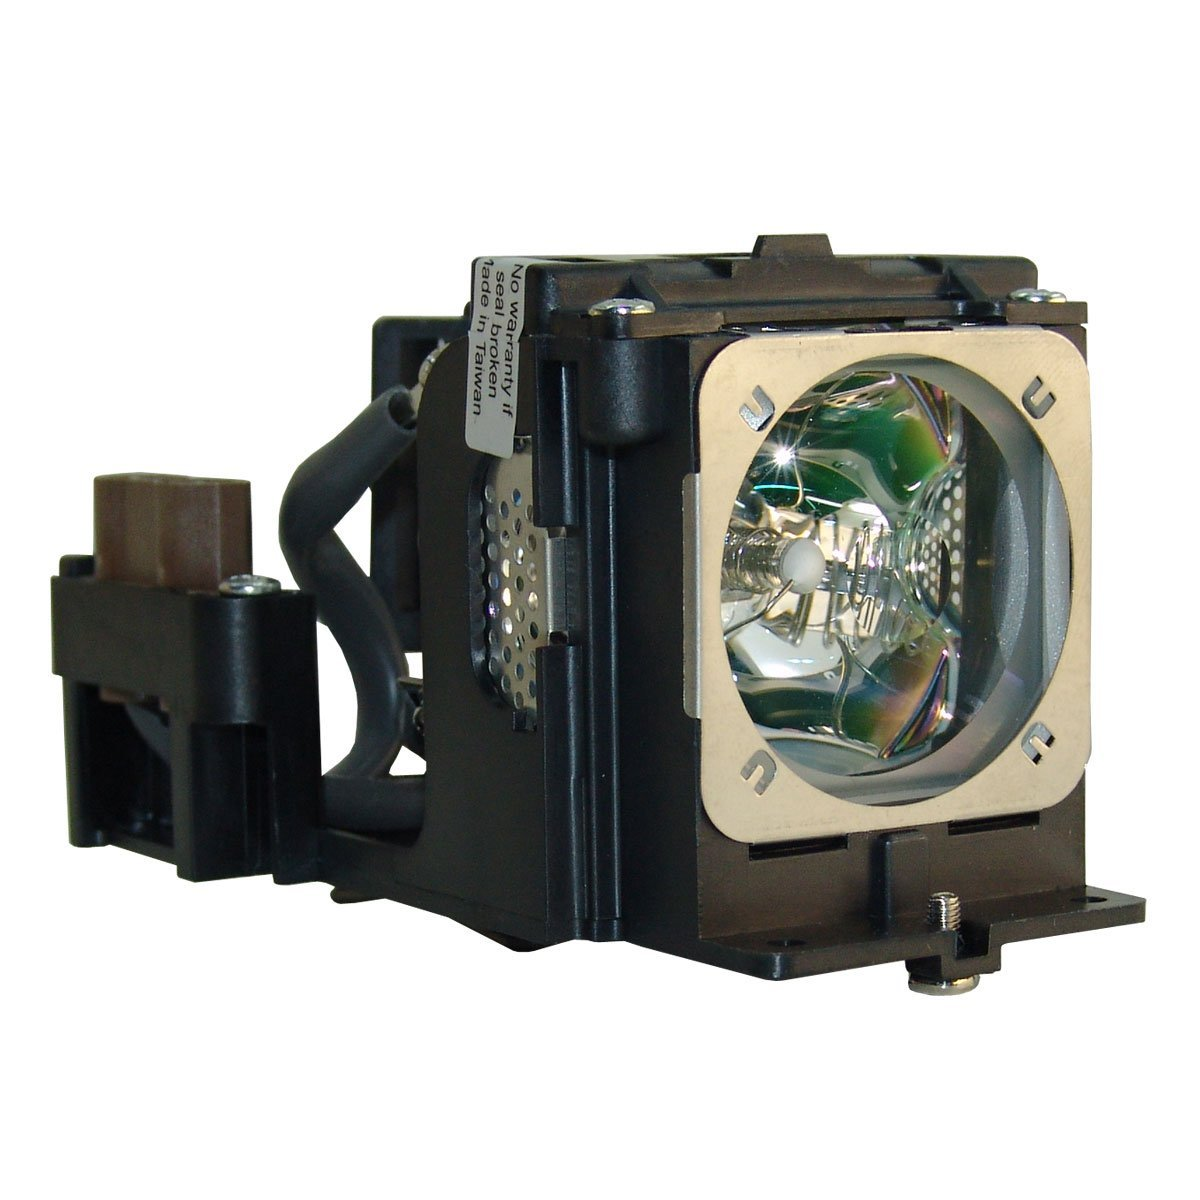 POA-LMP93 LMP93 610-323-0719 for SANYO PLC-XE30 PLC-XU70 PLC-XU2010C Projector Lamp Bulb with housing<br>